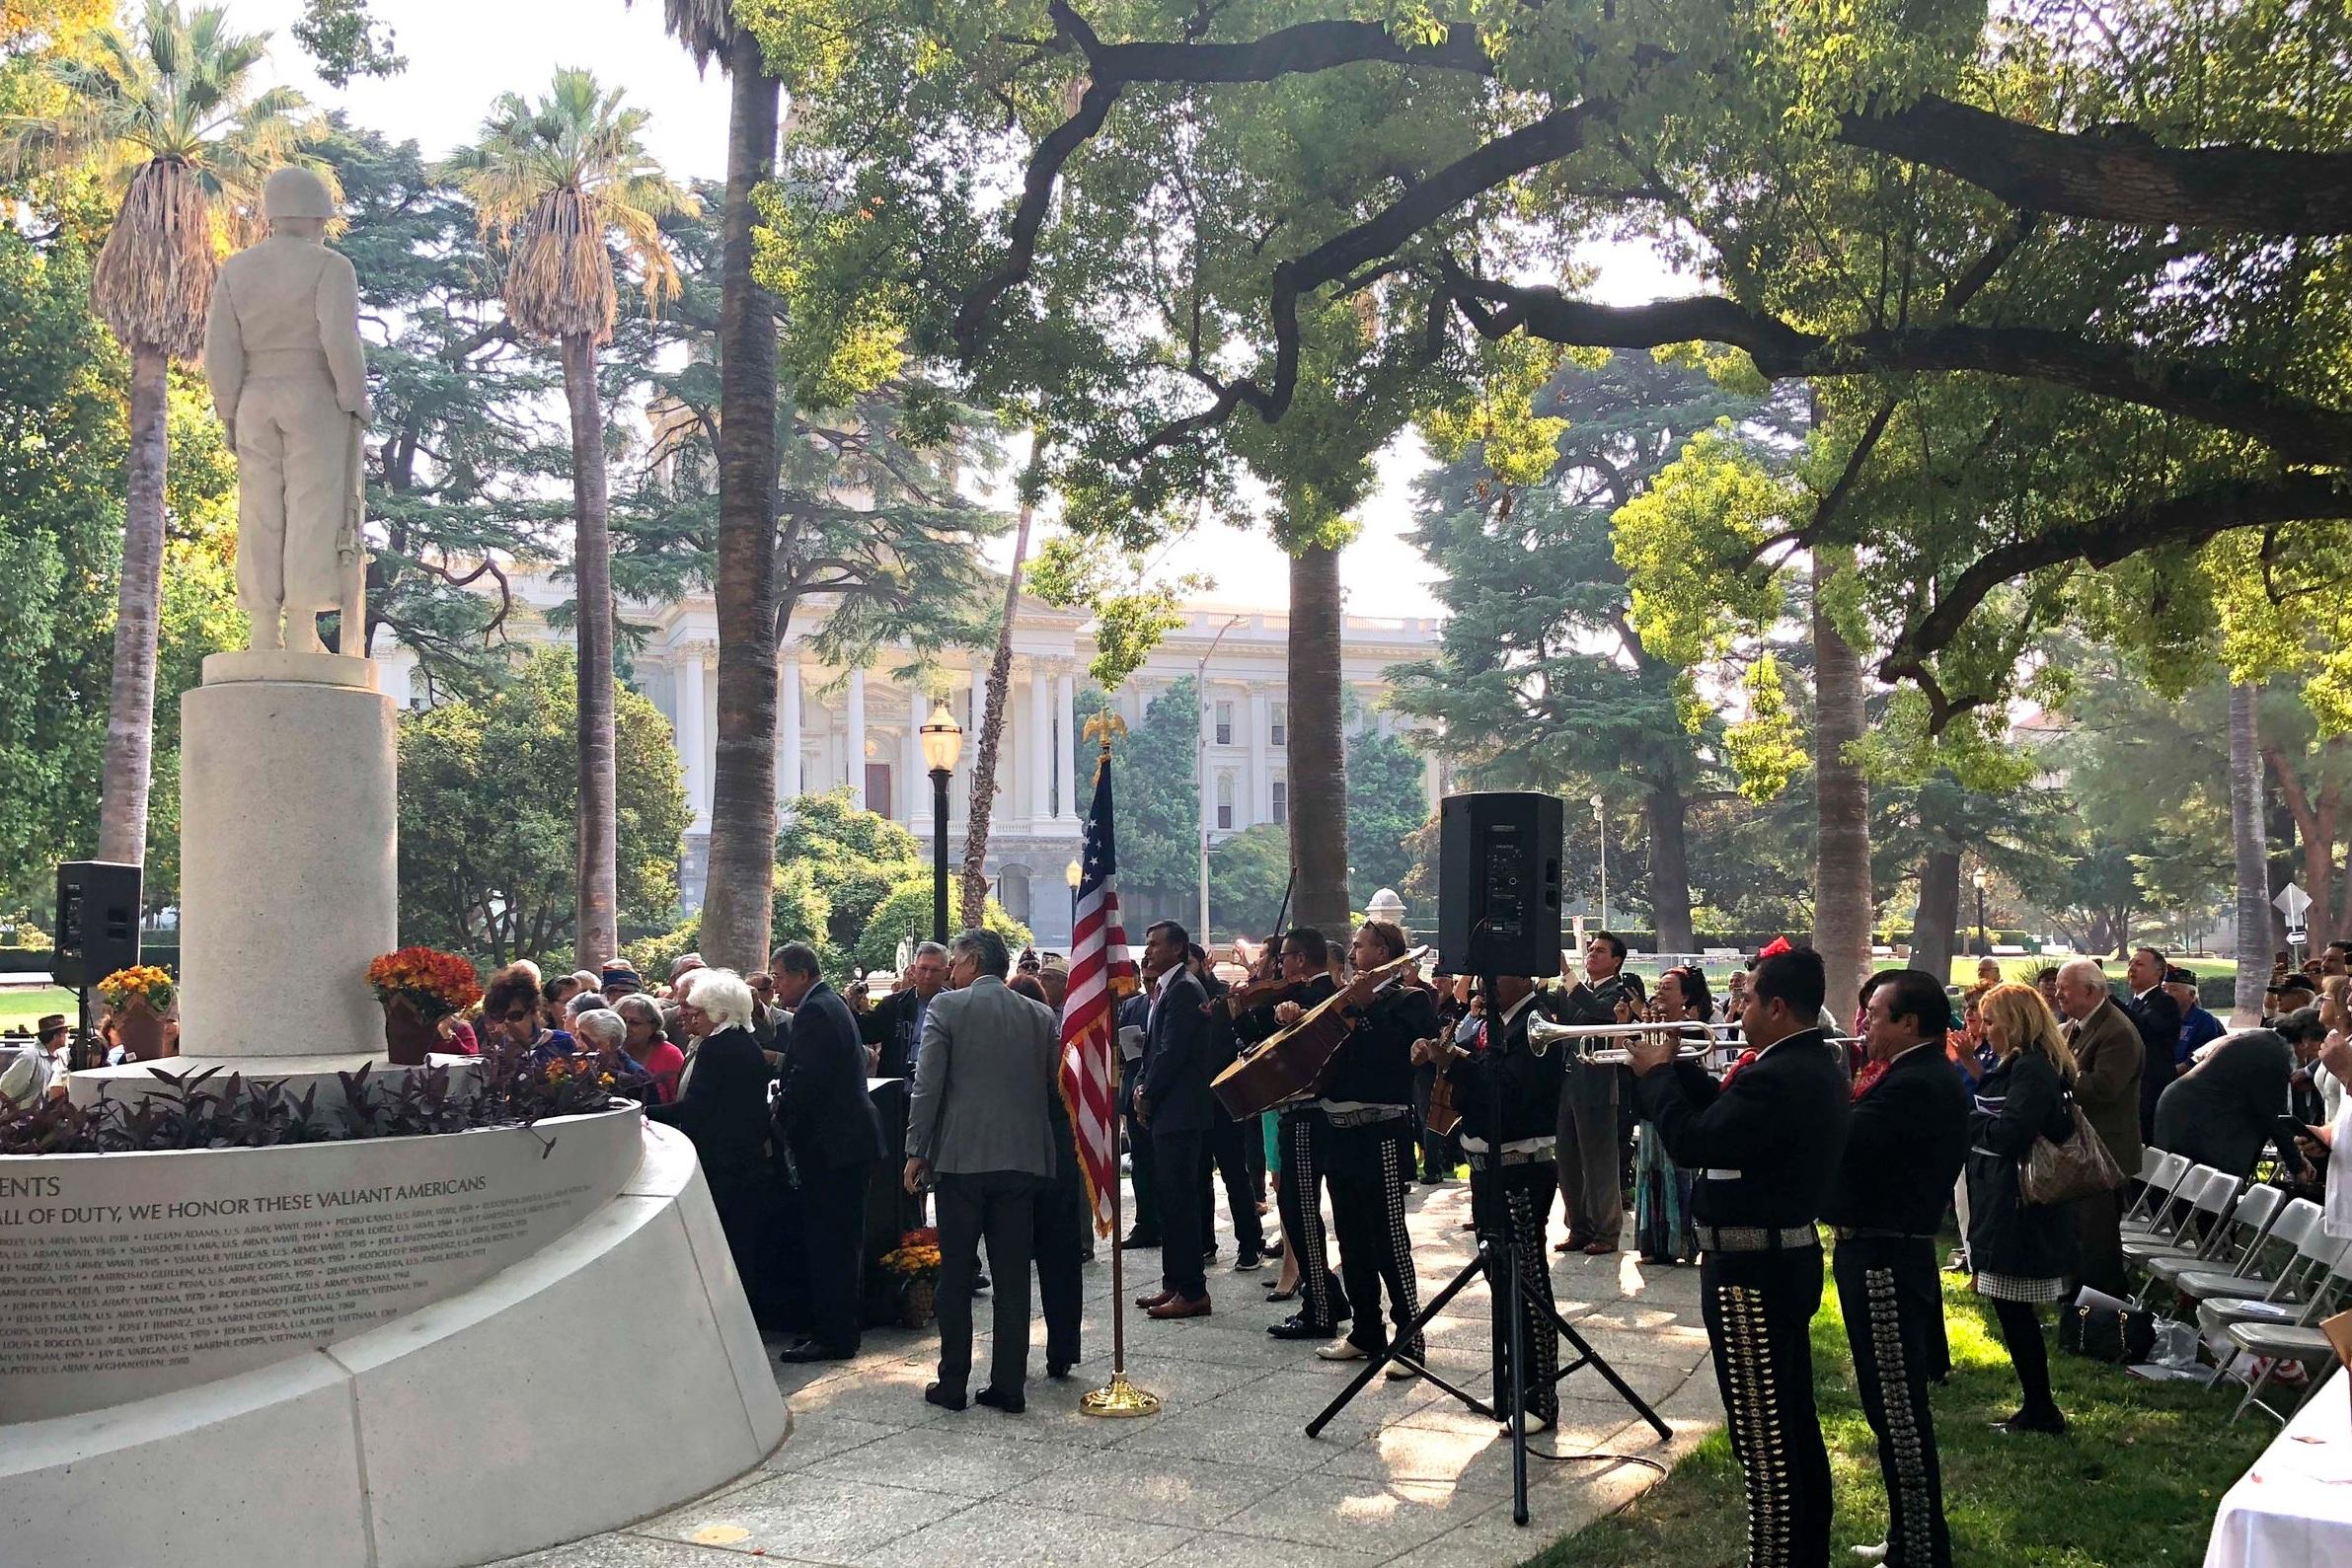 20171011 Mexican American Vets Memorial Dedication_Quad (12) web.jpg